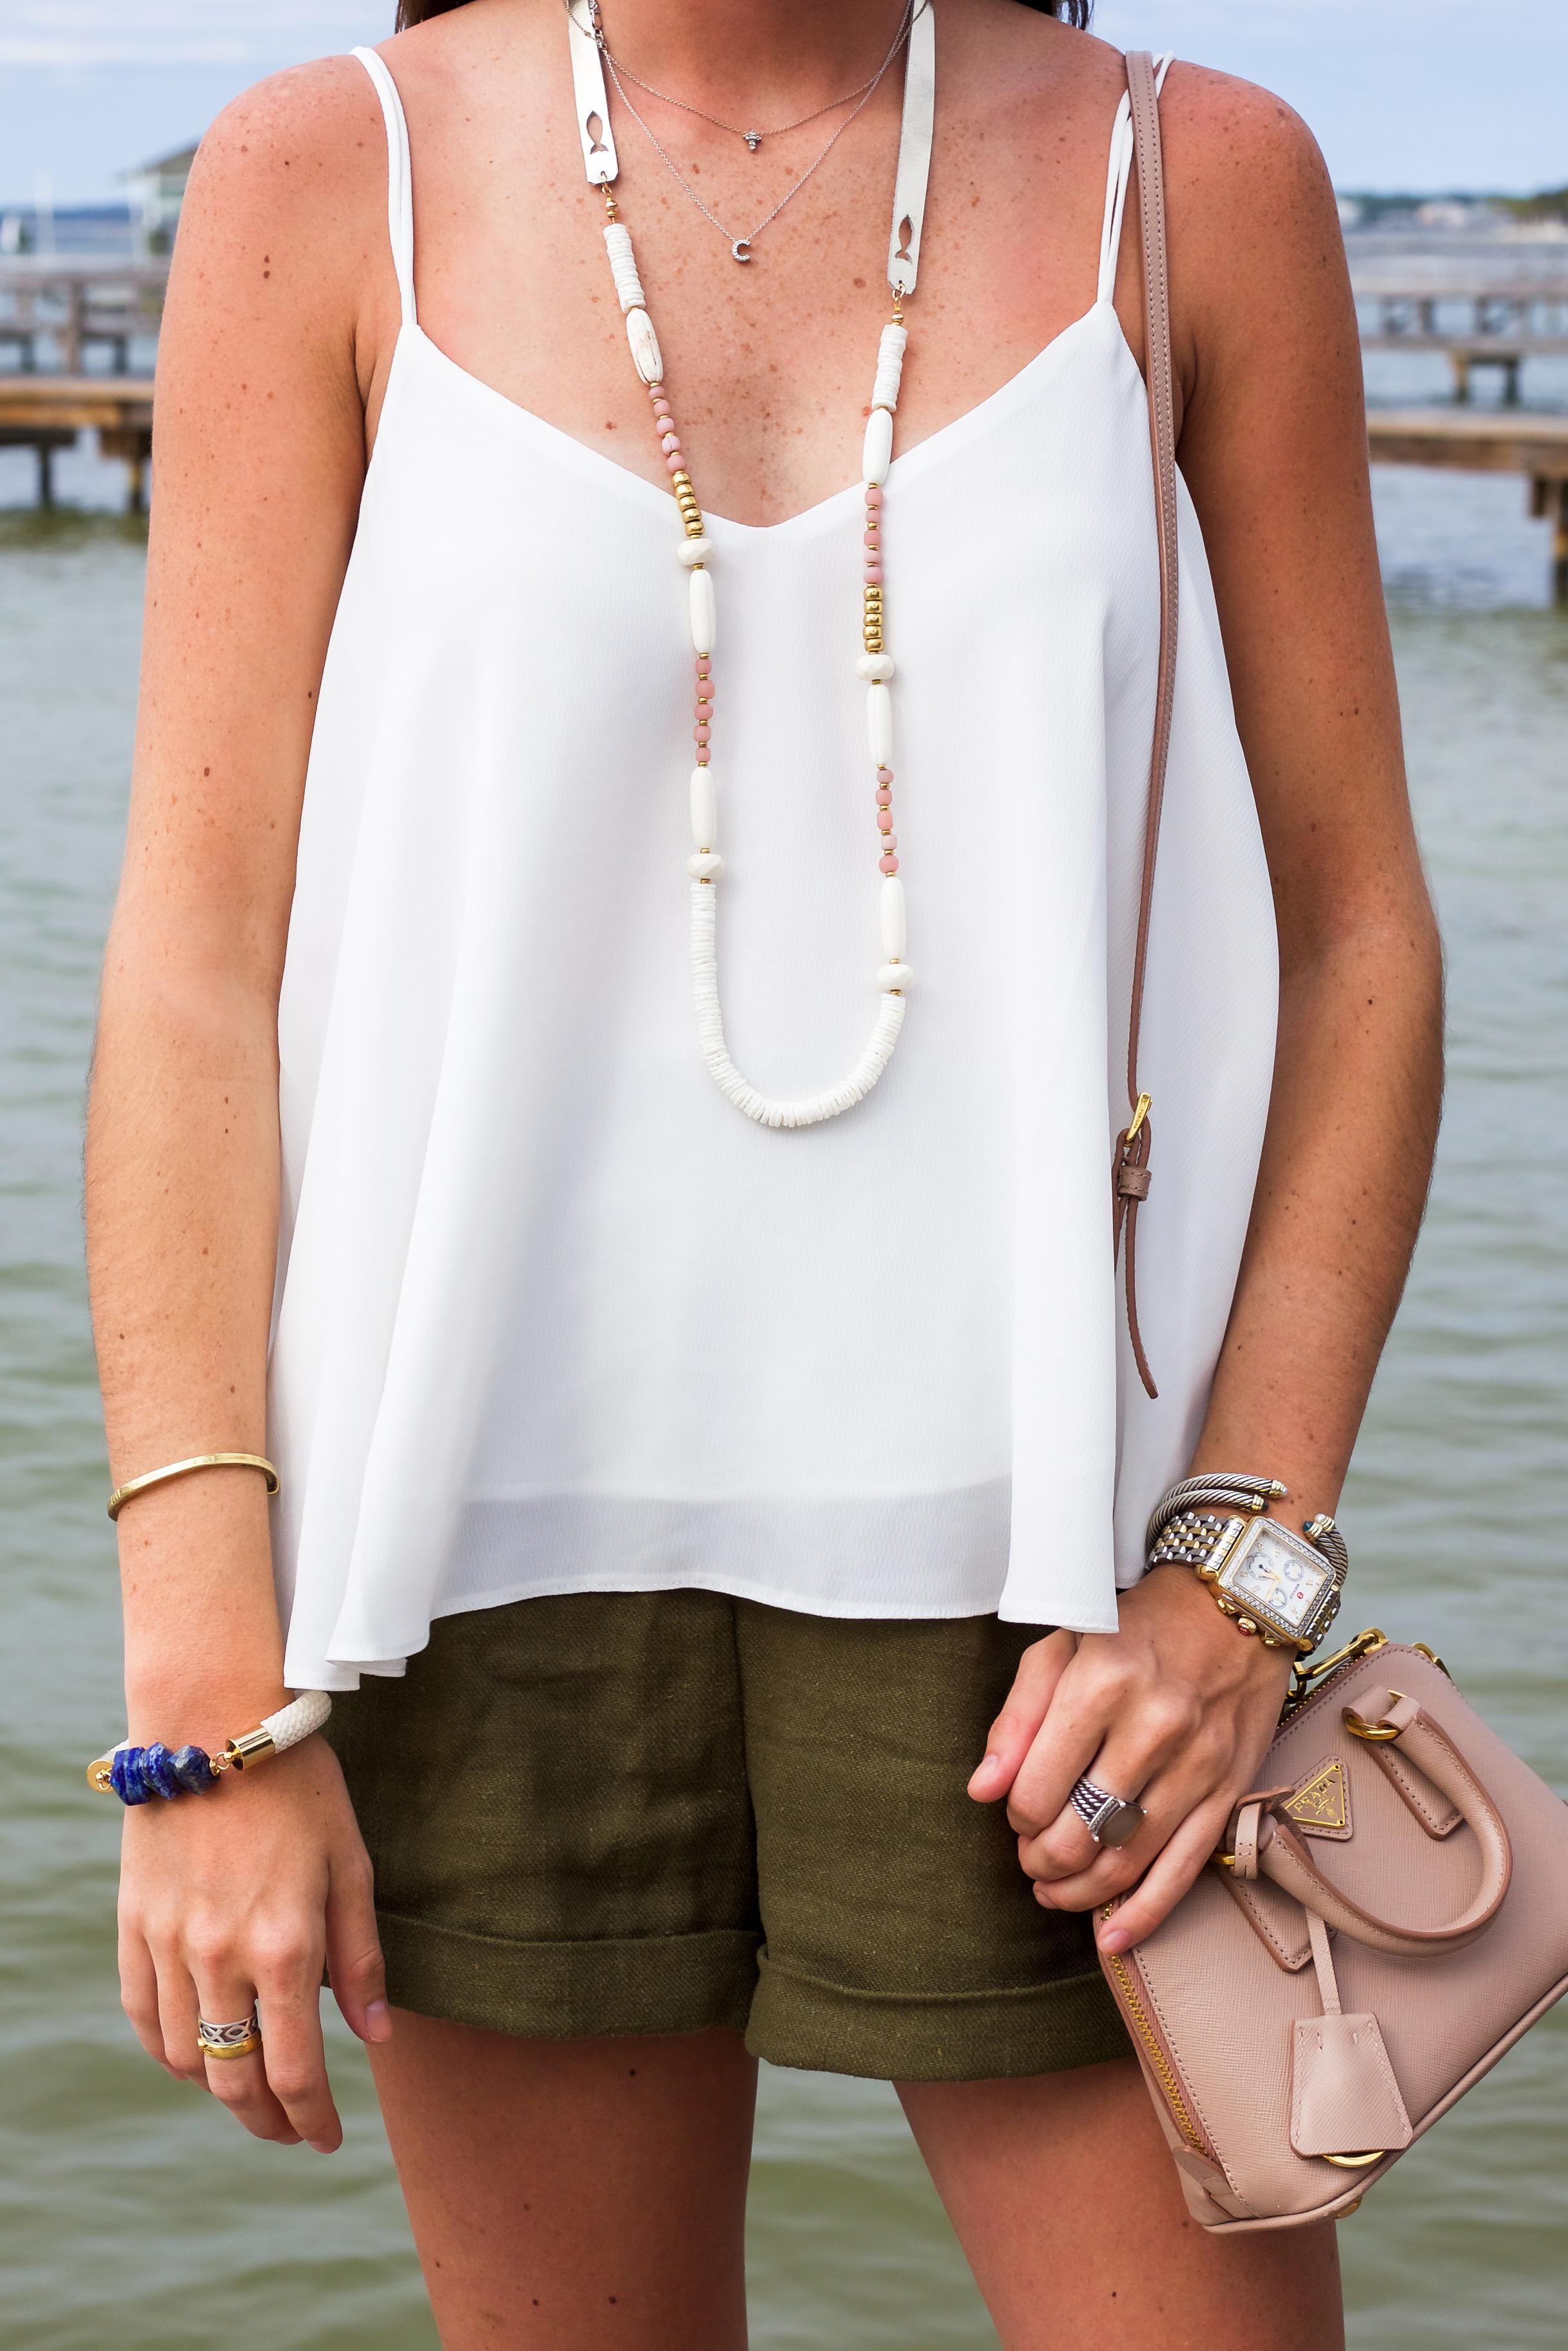 fashion blogger lcb style beach soludos topshop (19 of 21).jpg